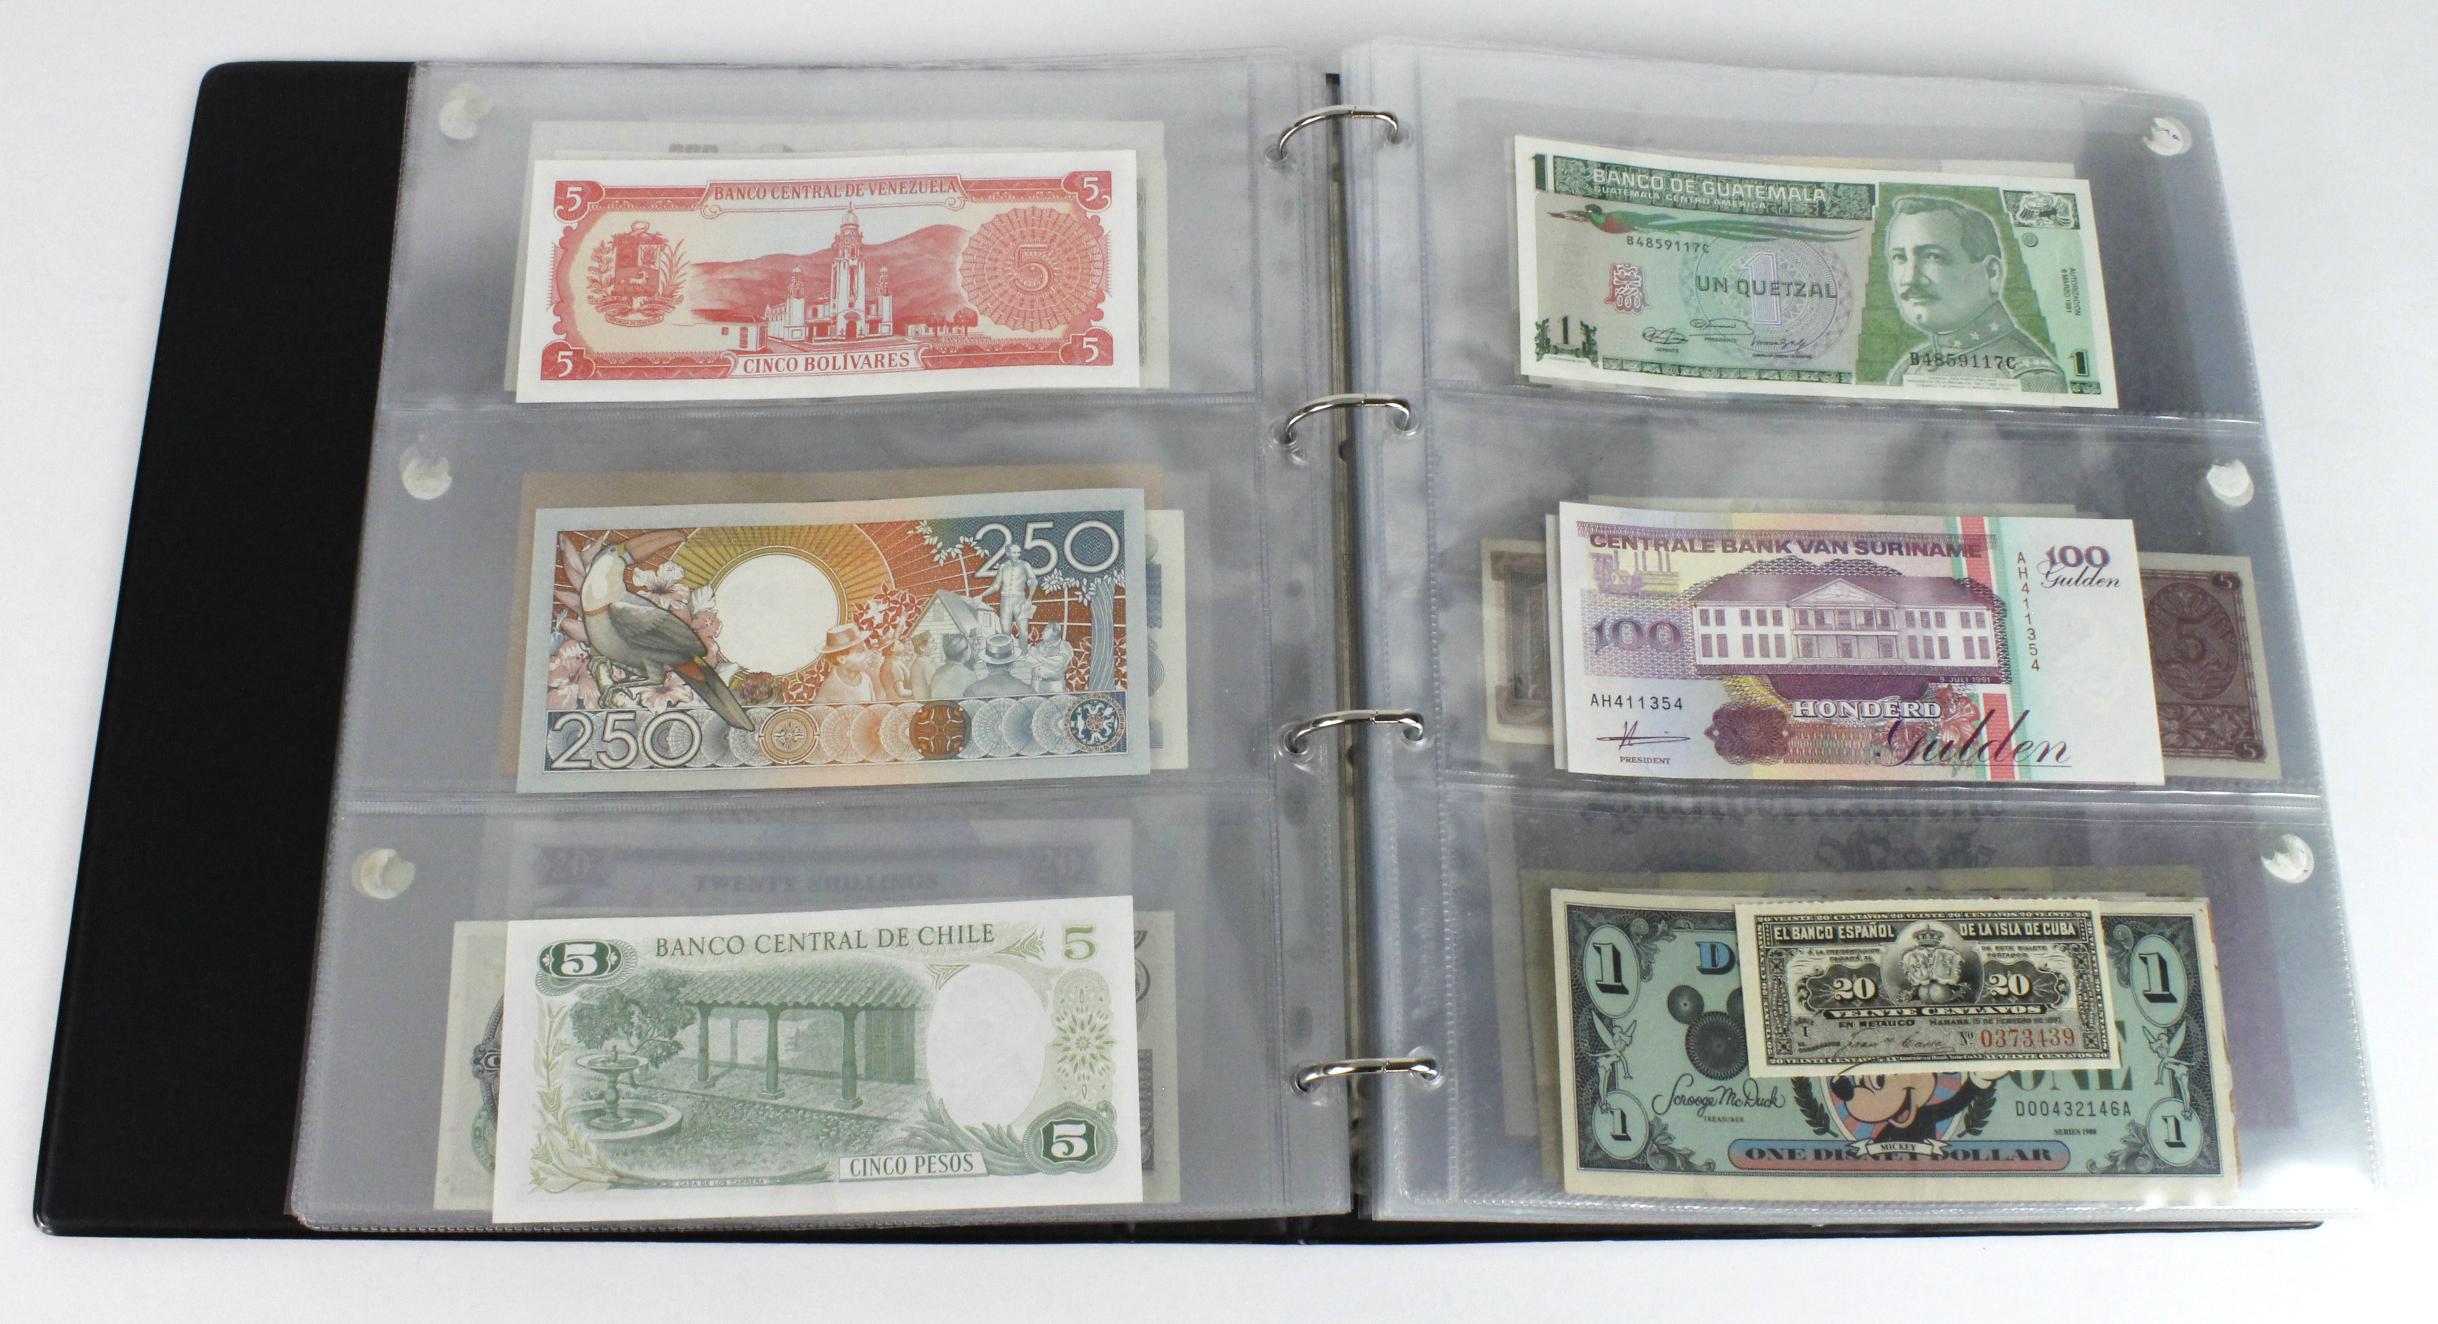 World (163), in banknote album including Bahamas, Spain, Sweden, Netherlands, Algeria, Macau, - Image 16 of 57